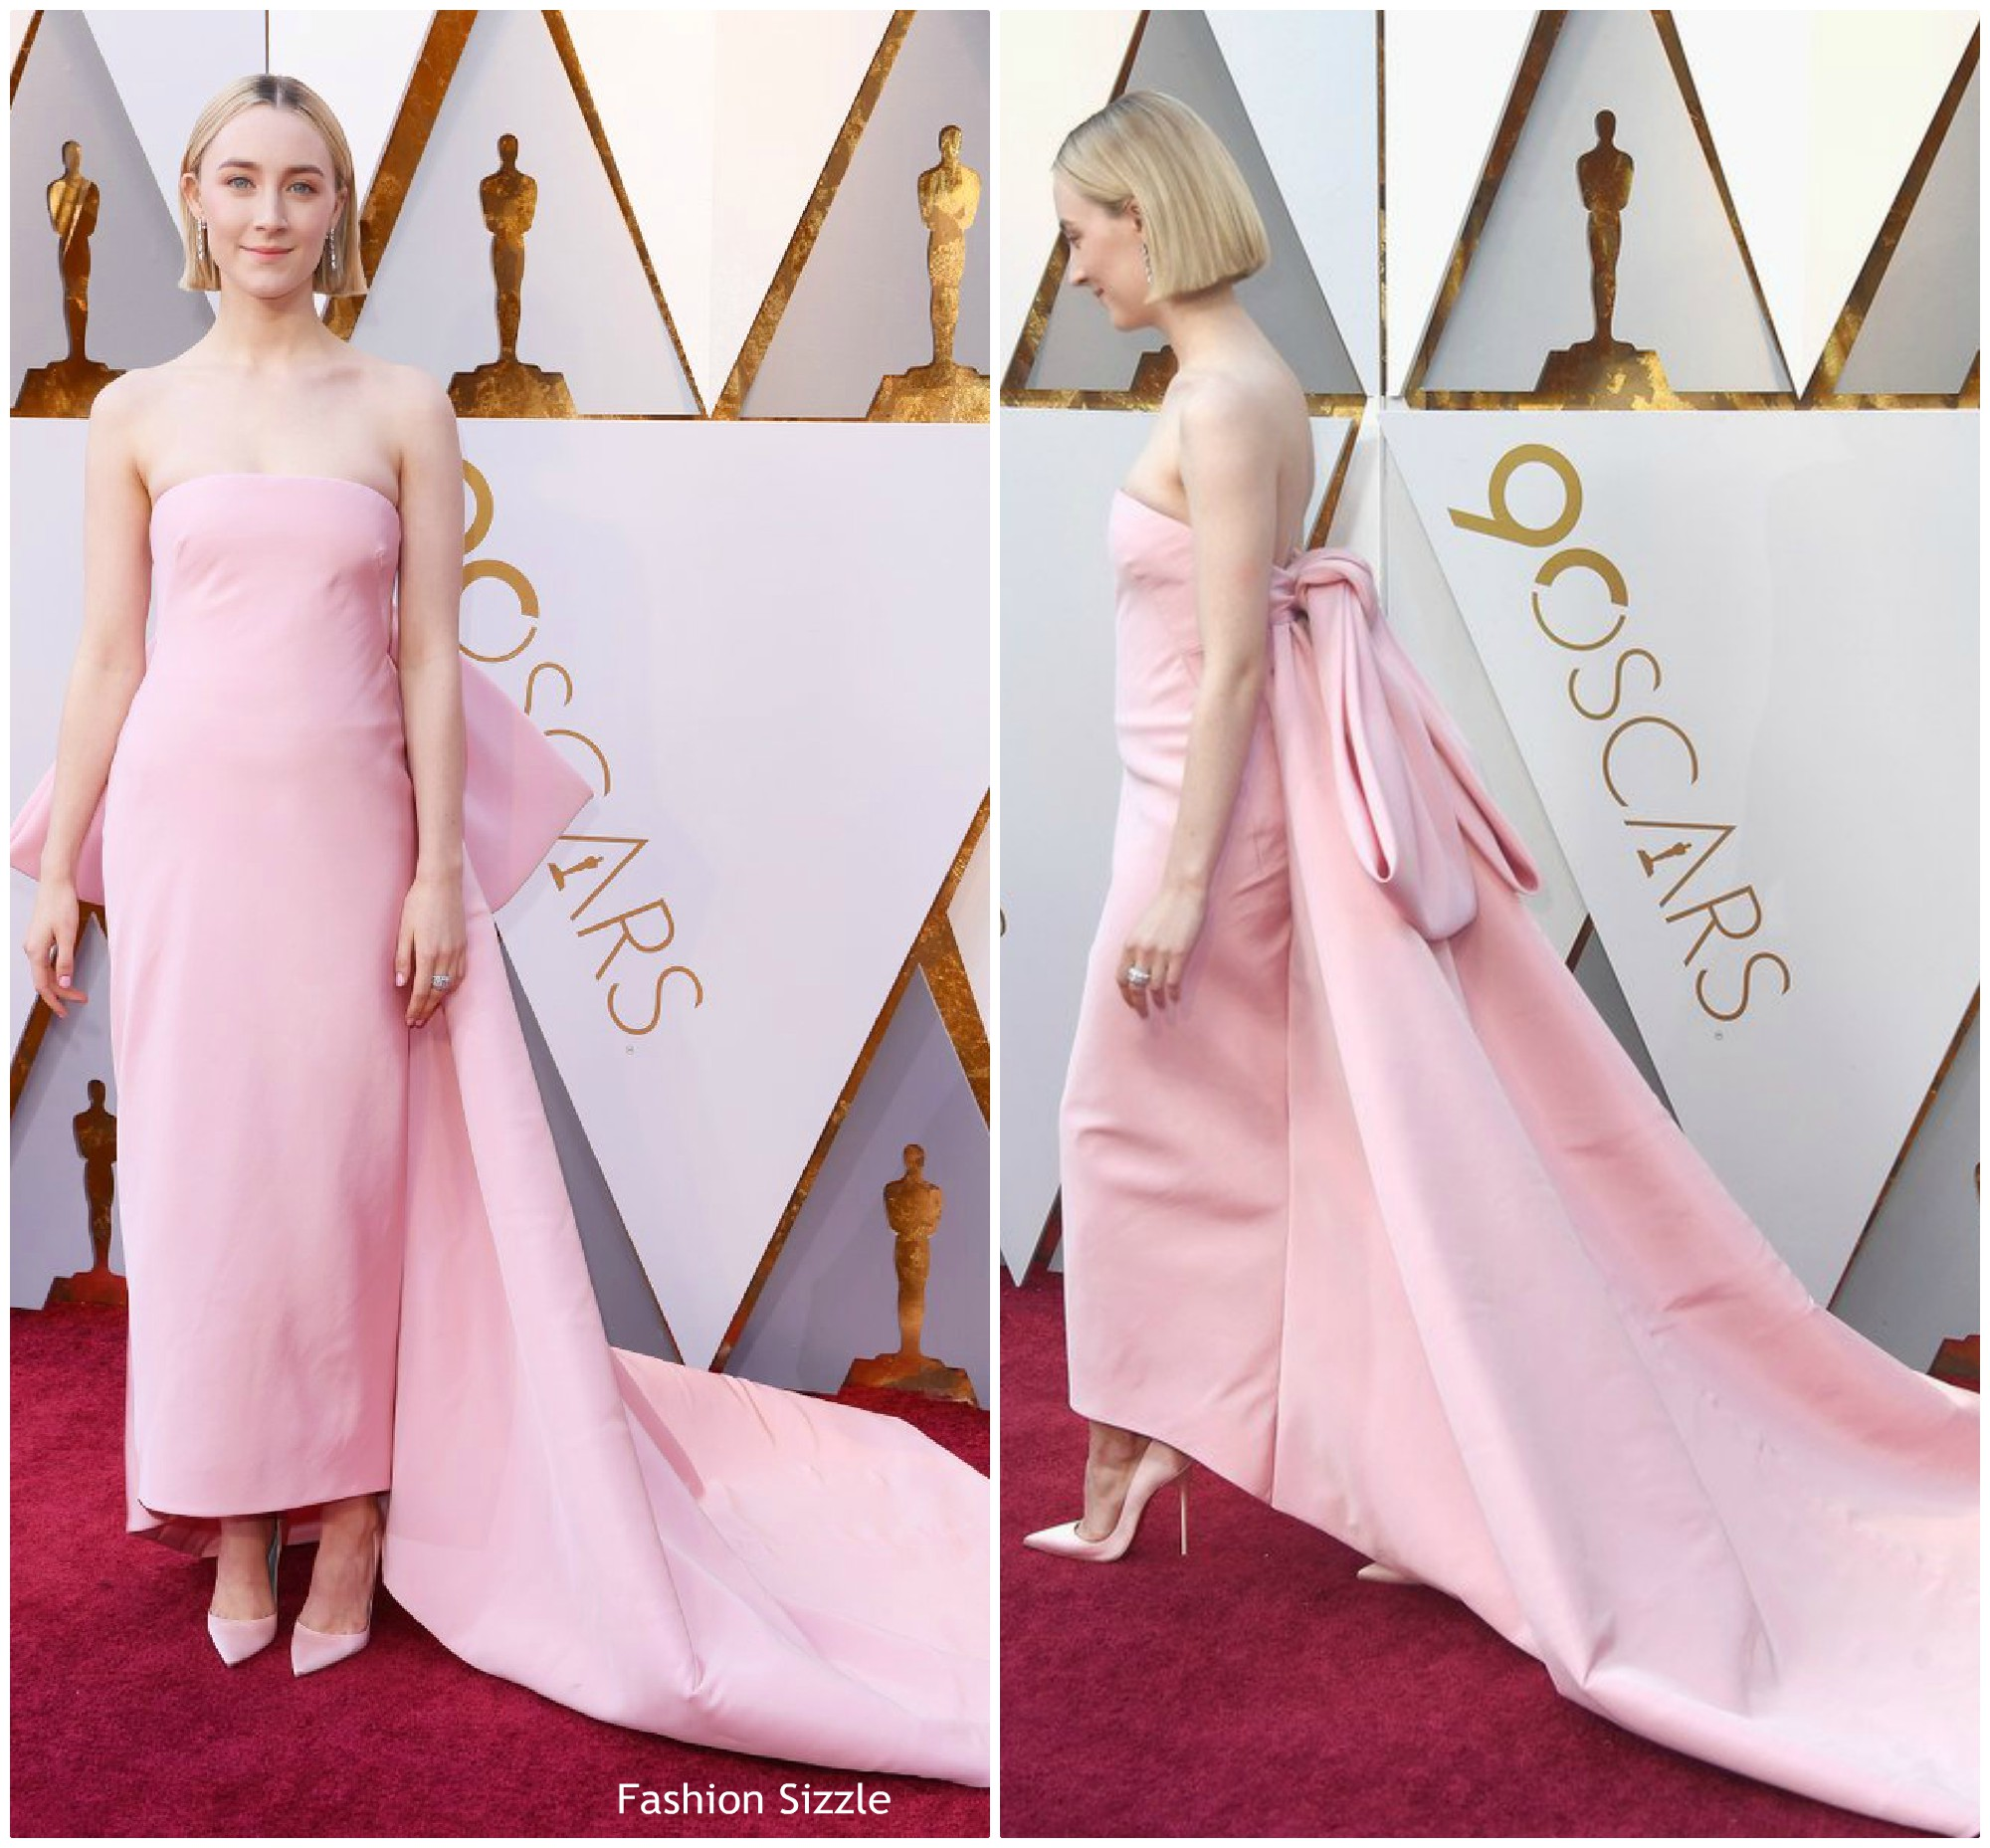 Bonito Vestido De Novia De Calvin Klein Molde - Colección de ...